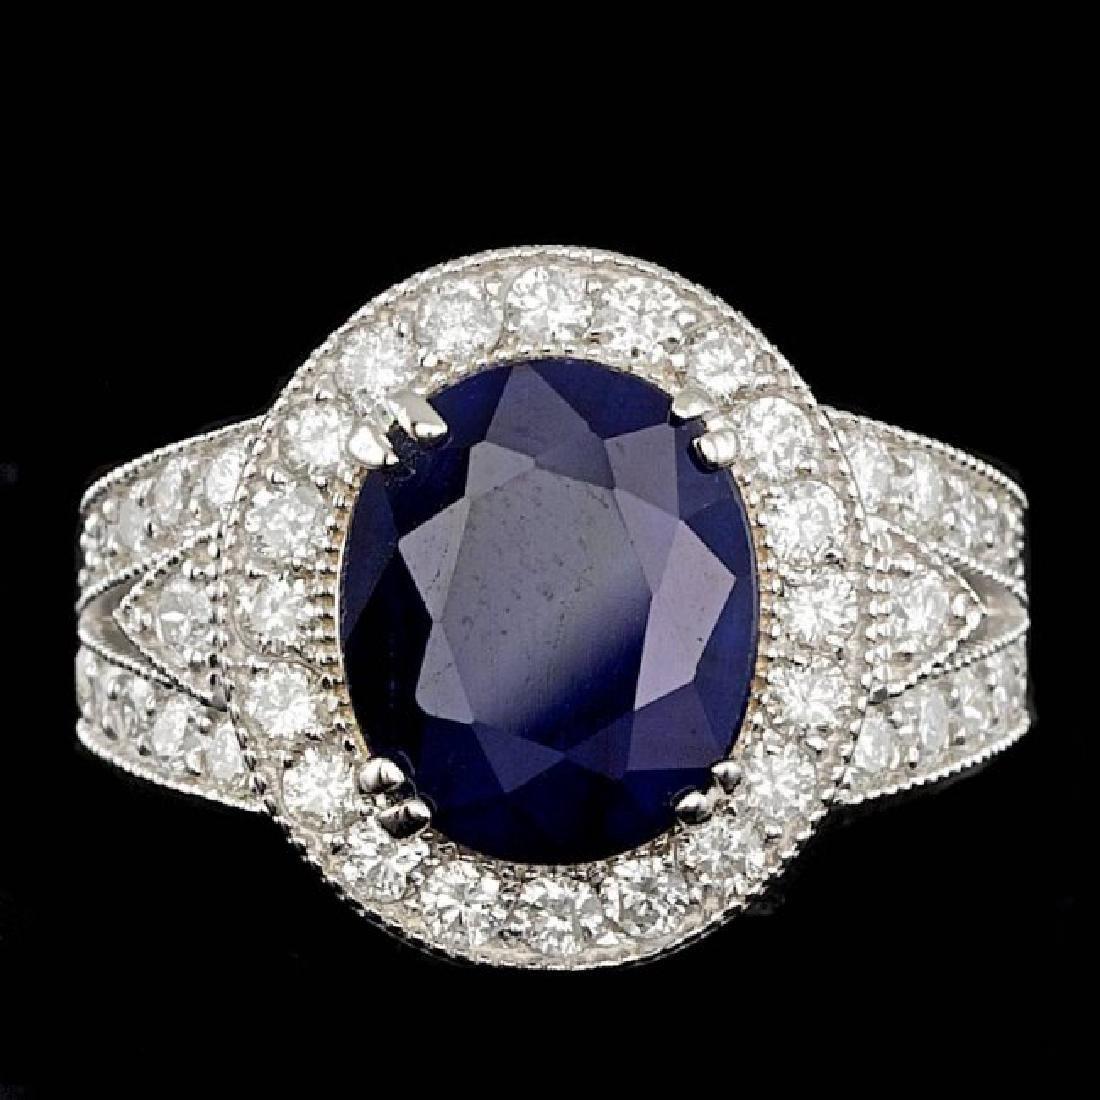 14k Gold 6.50ct Sapphire 1.60ct Diamond Ring